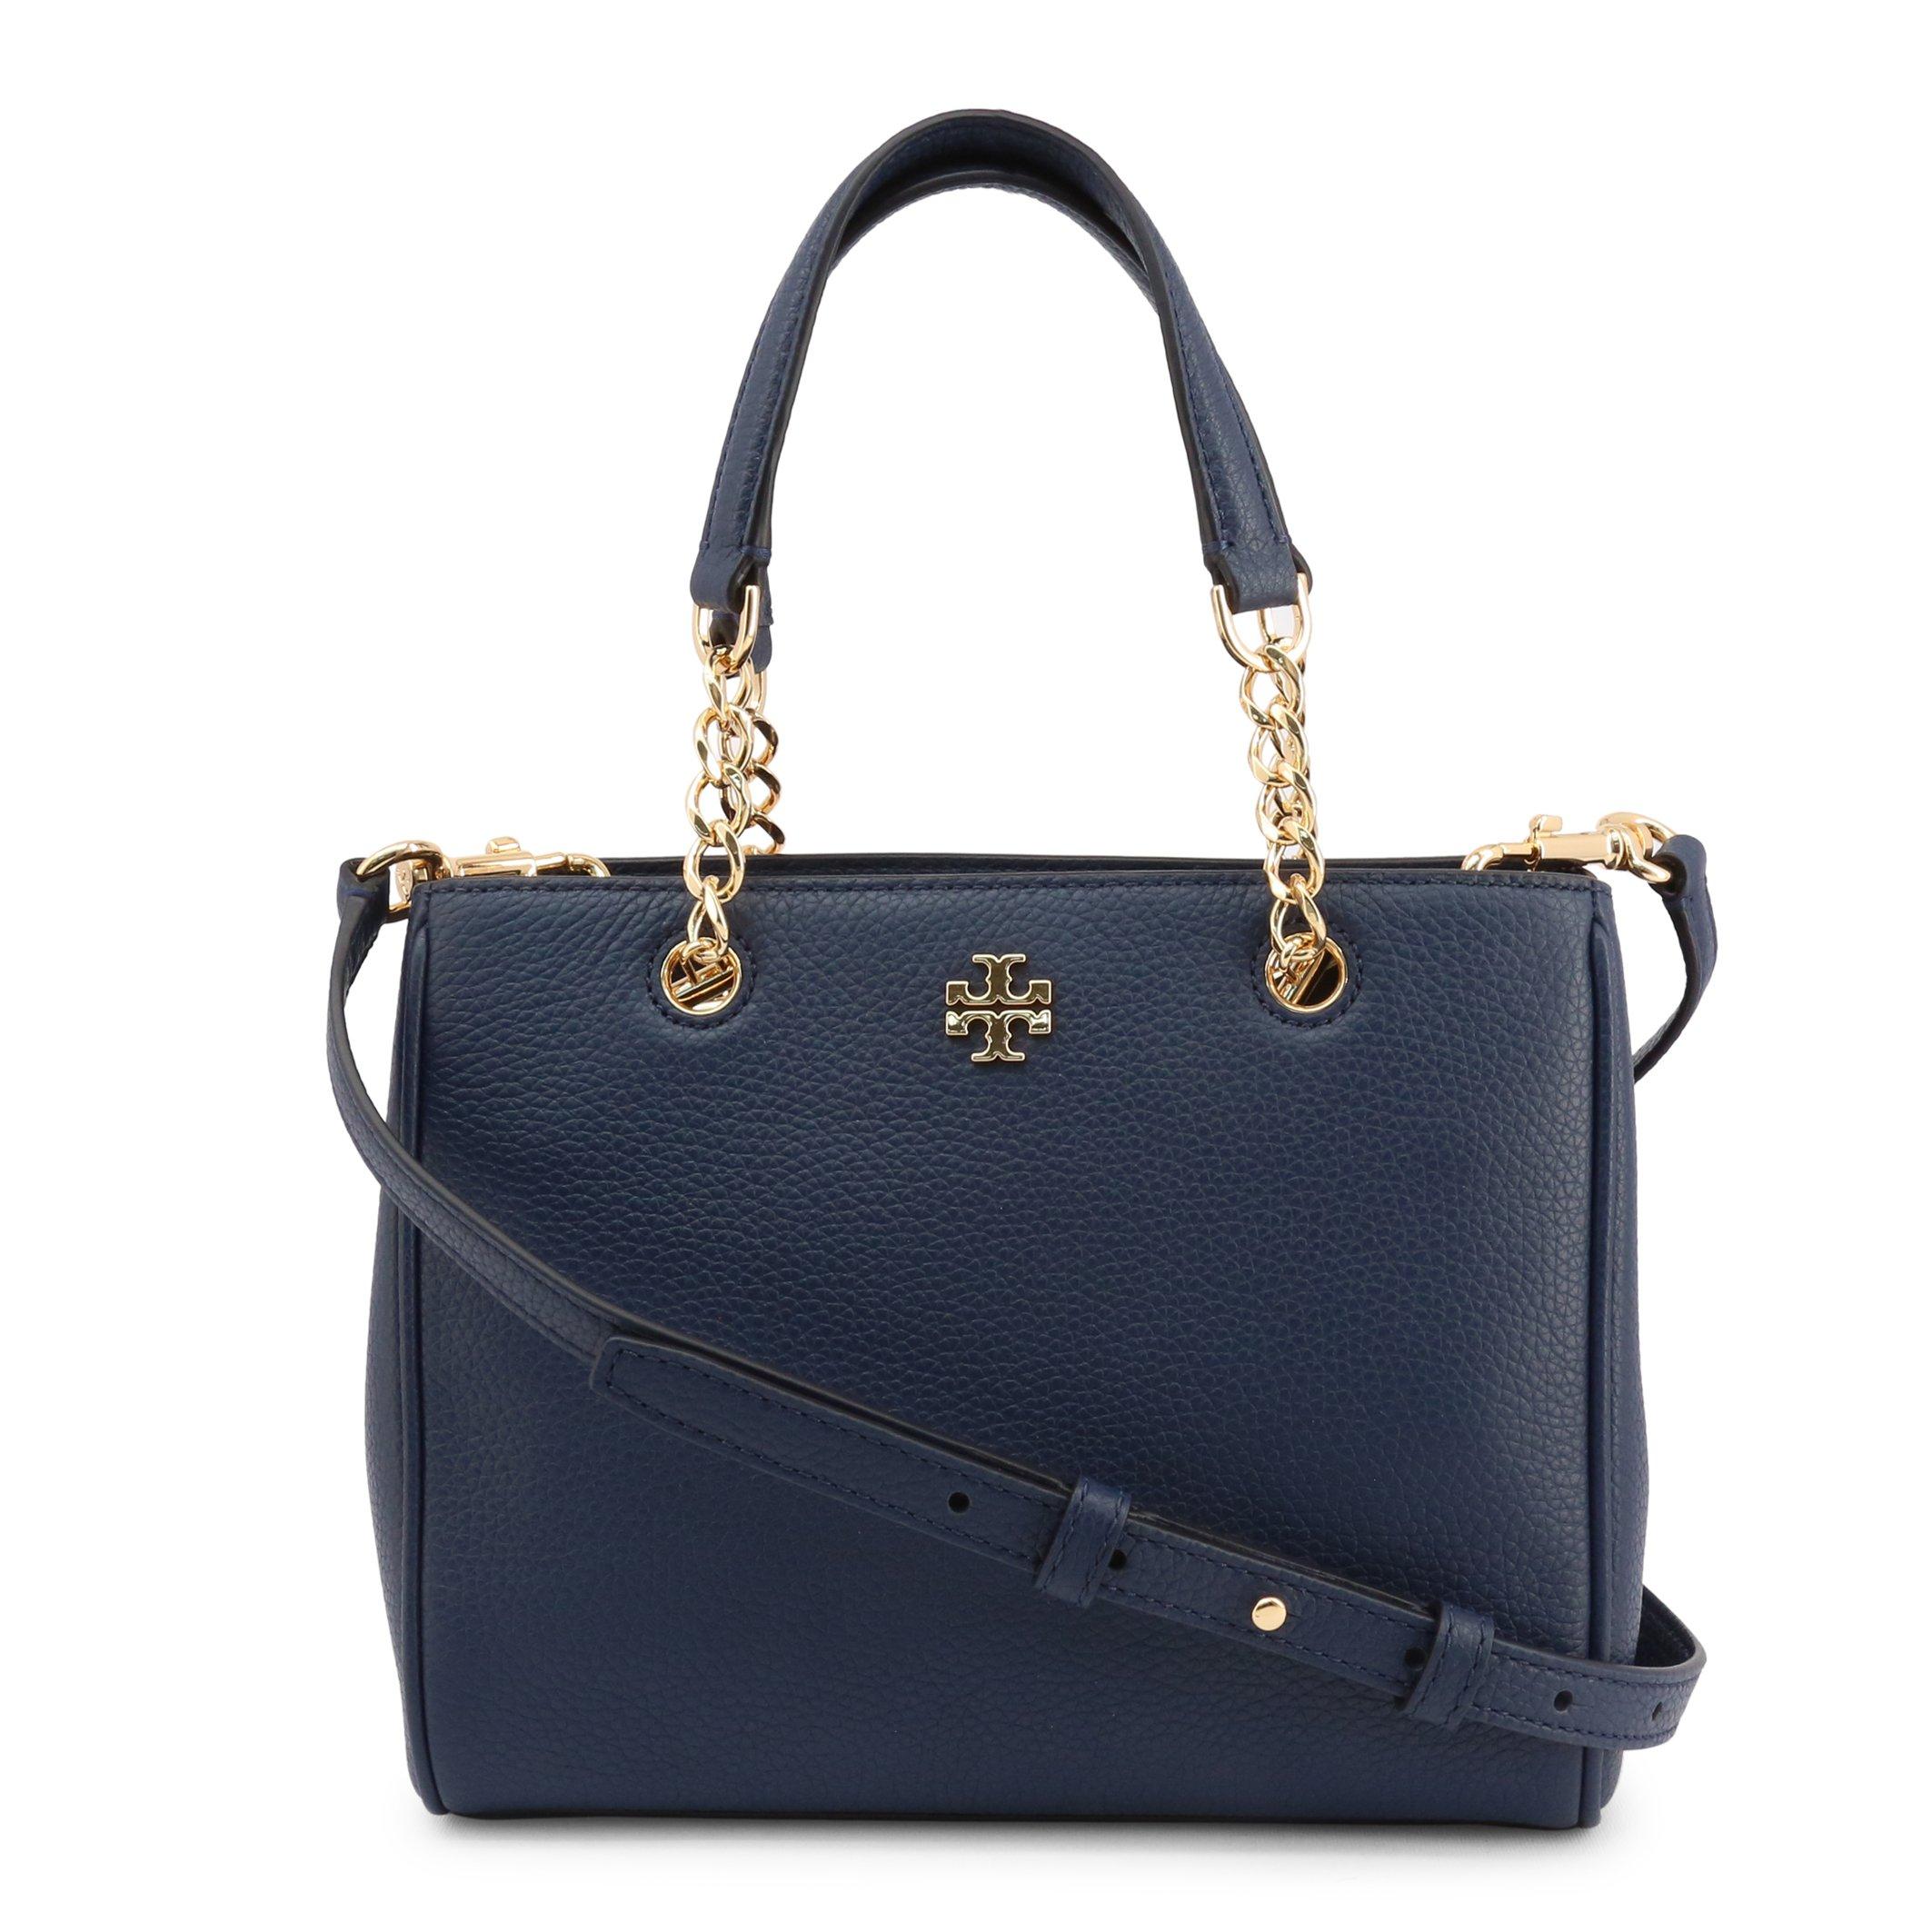 Tory Burch Women's Handbag Various Colours 67316 - blue NOSIZE